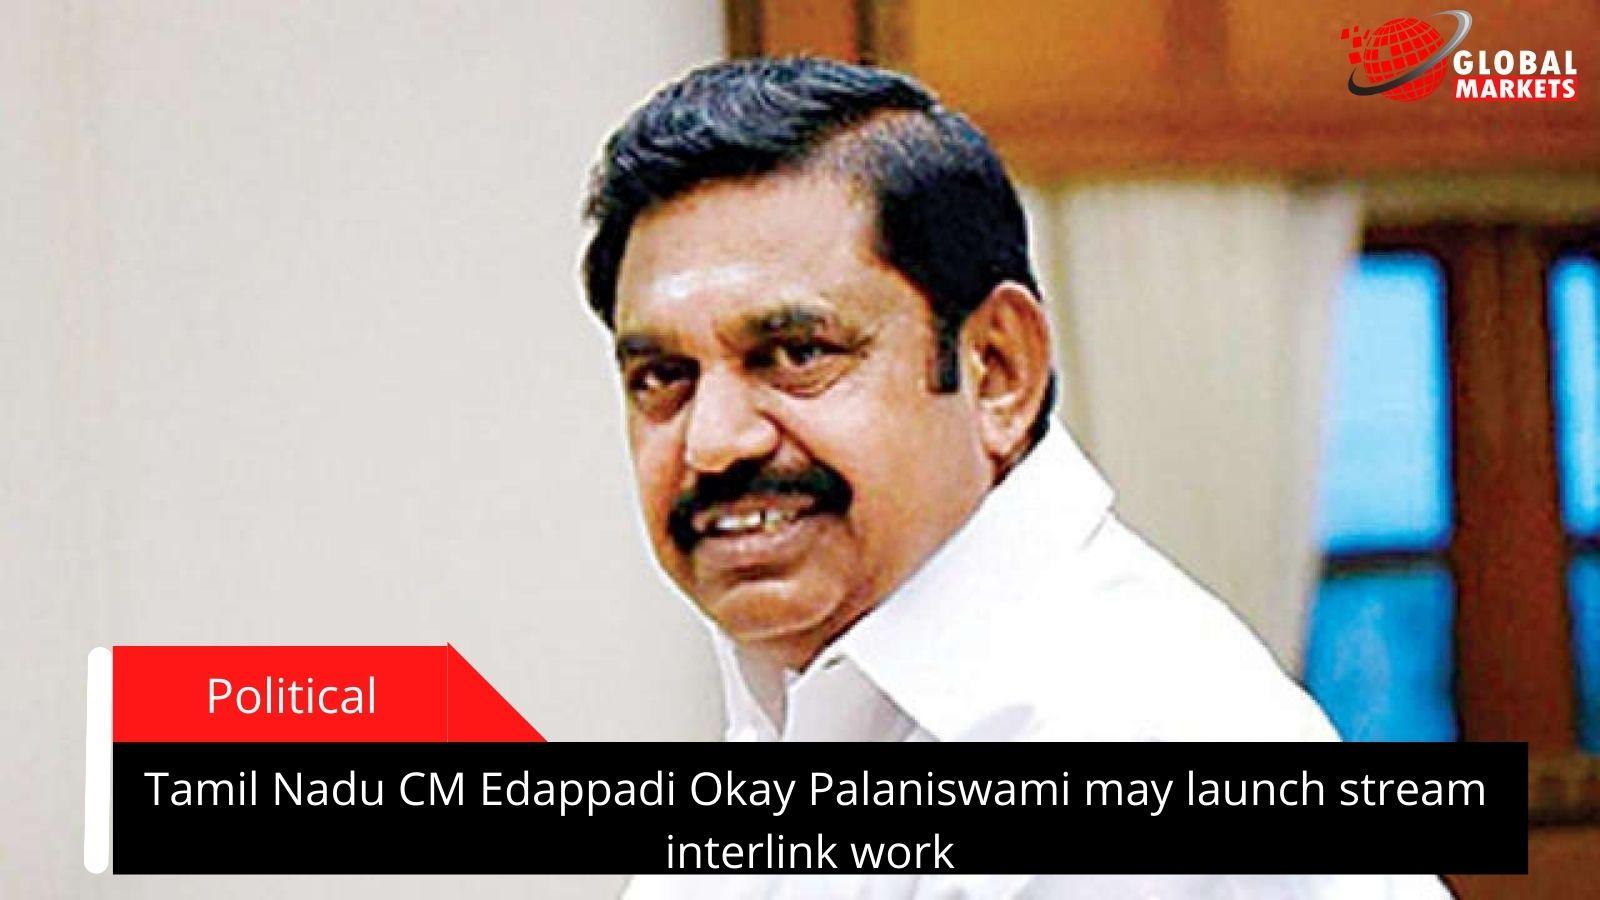 Tamil Nadu CM Edappadi Okay Palaniswami may launch stream interlink work